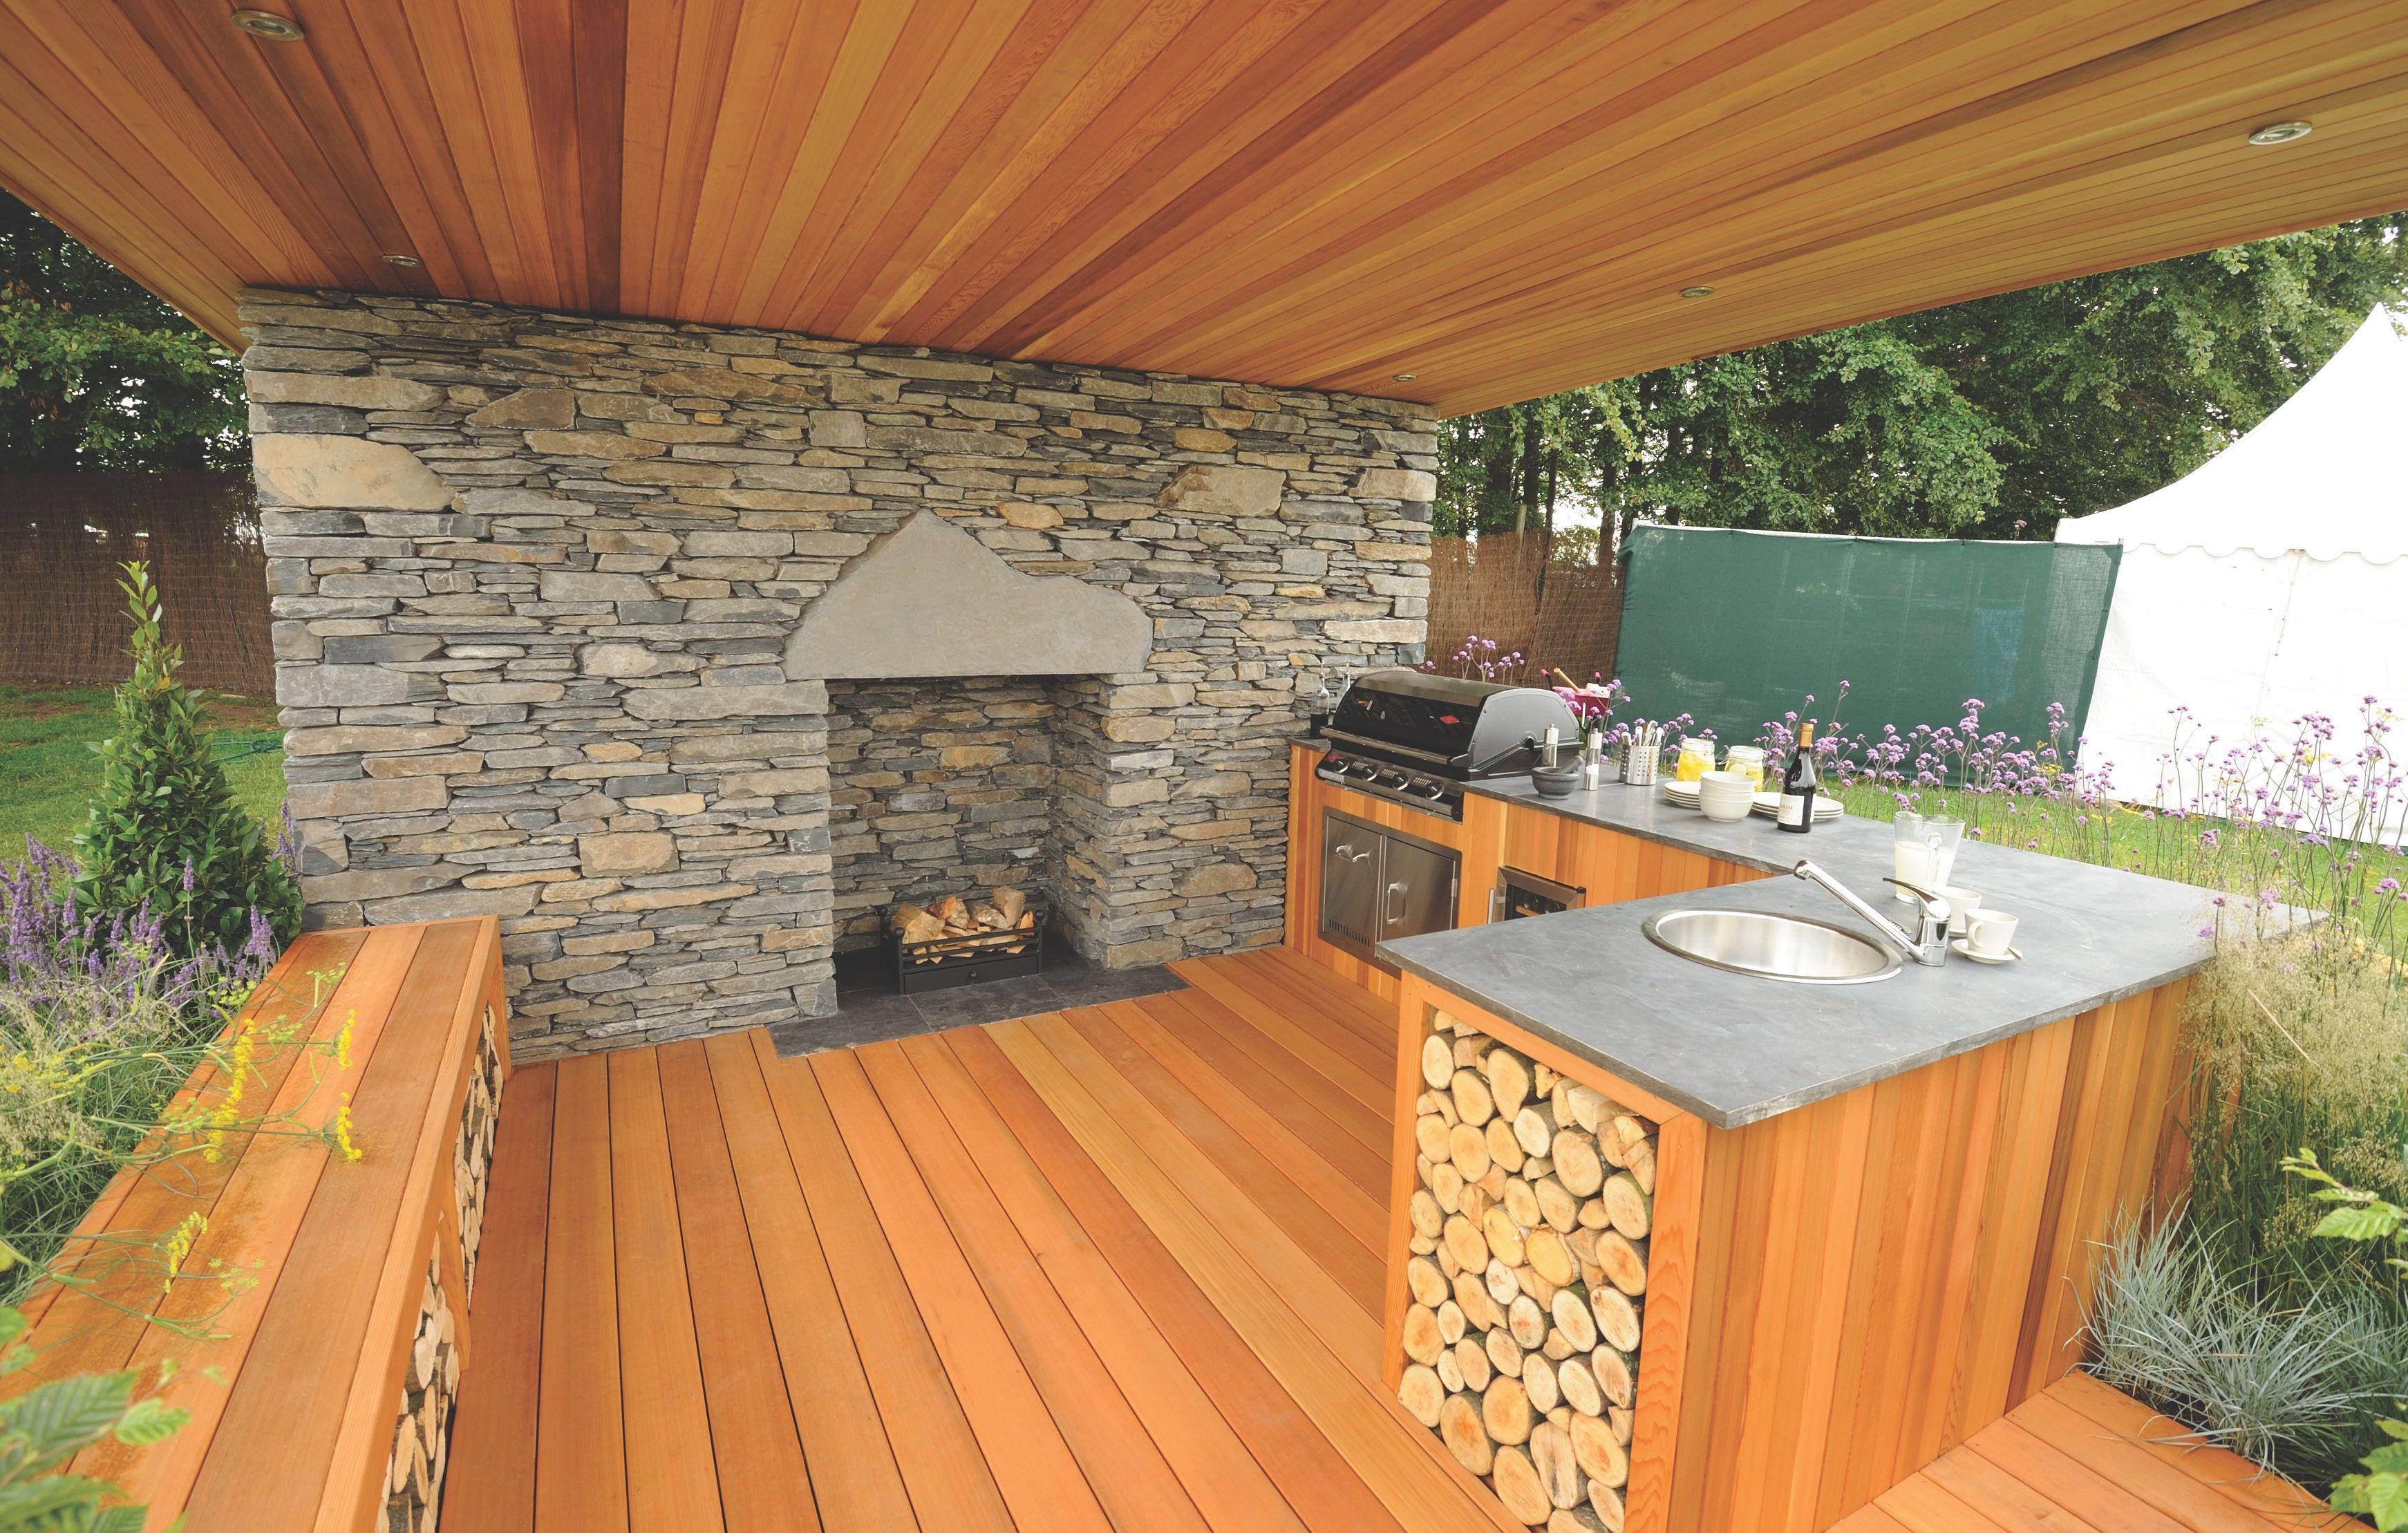 Western Red Cedar Outdoor Projects Outdoor Kitchen Design Outdoor Kitchen Backyard